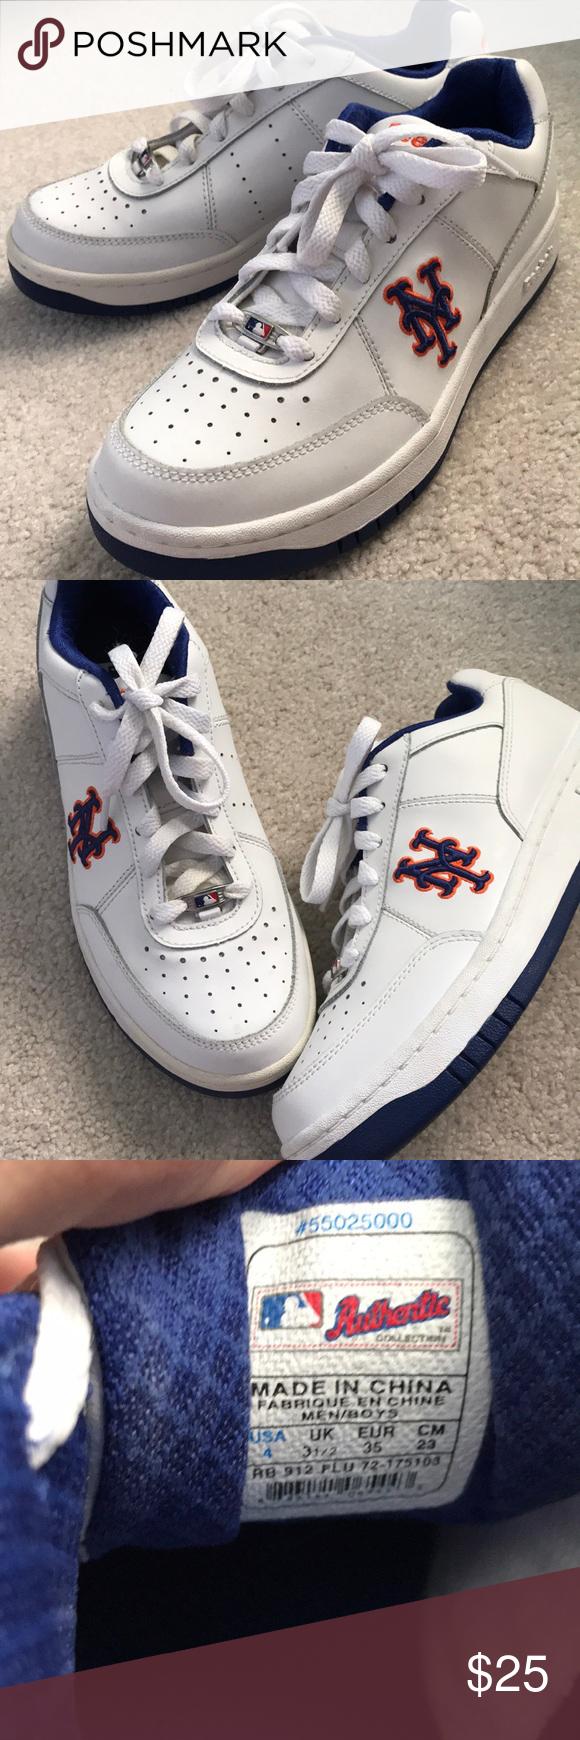 Reebok NY Mets sneakers fits wm sz 6